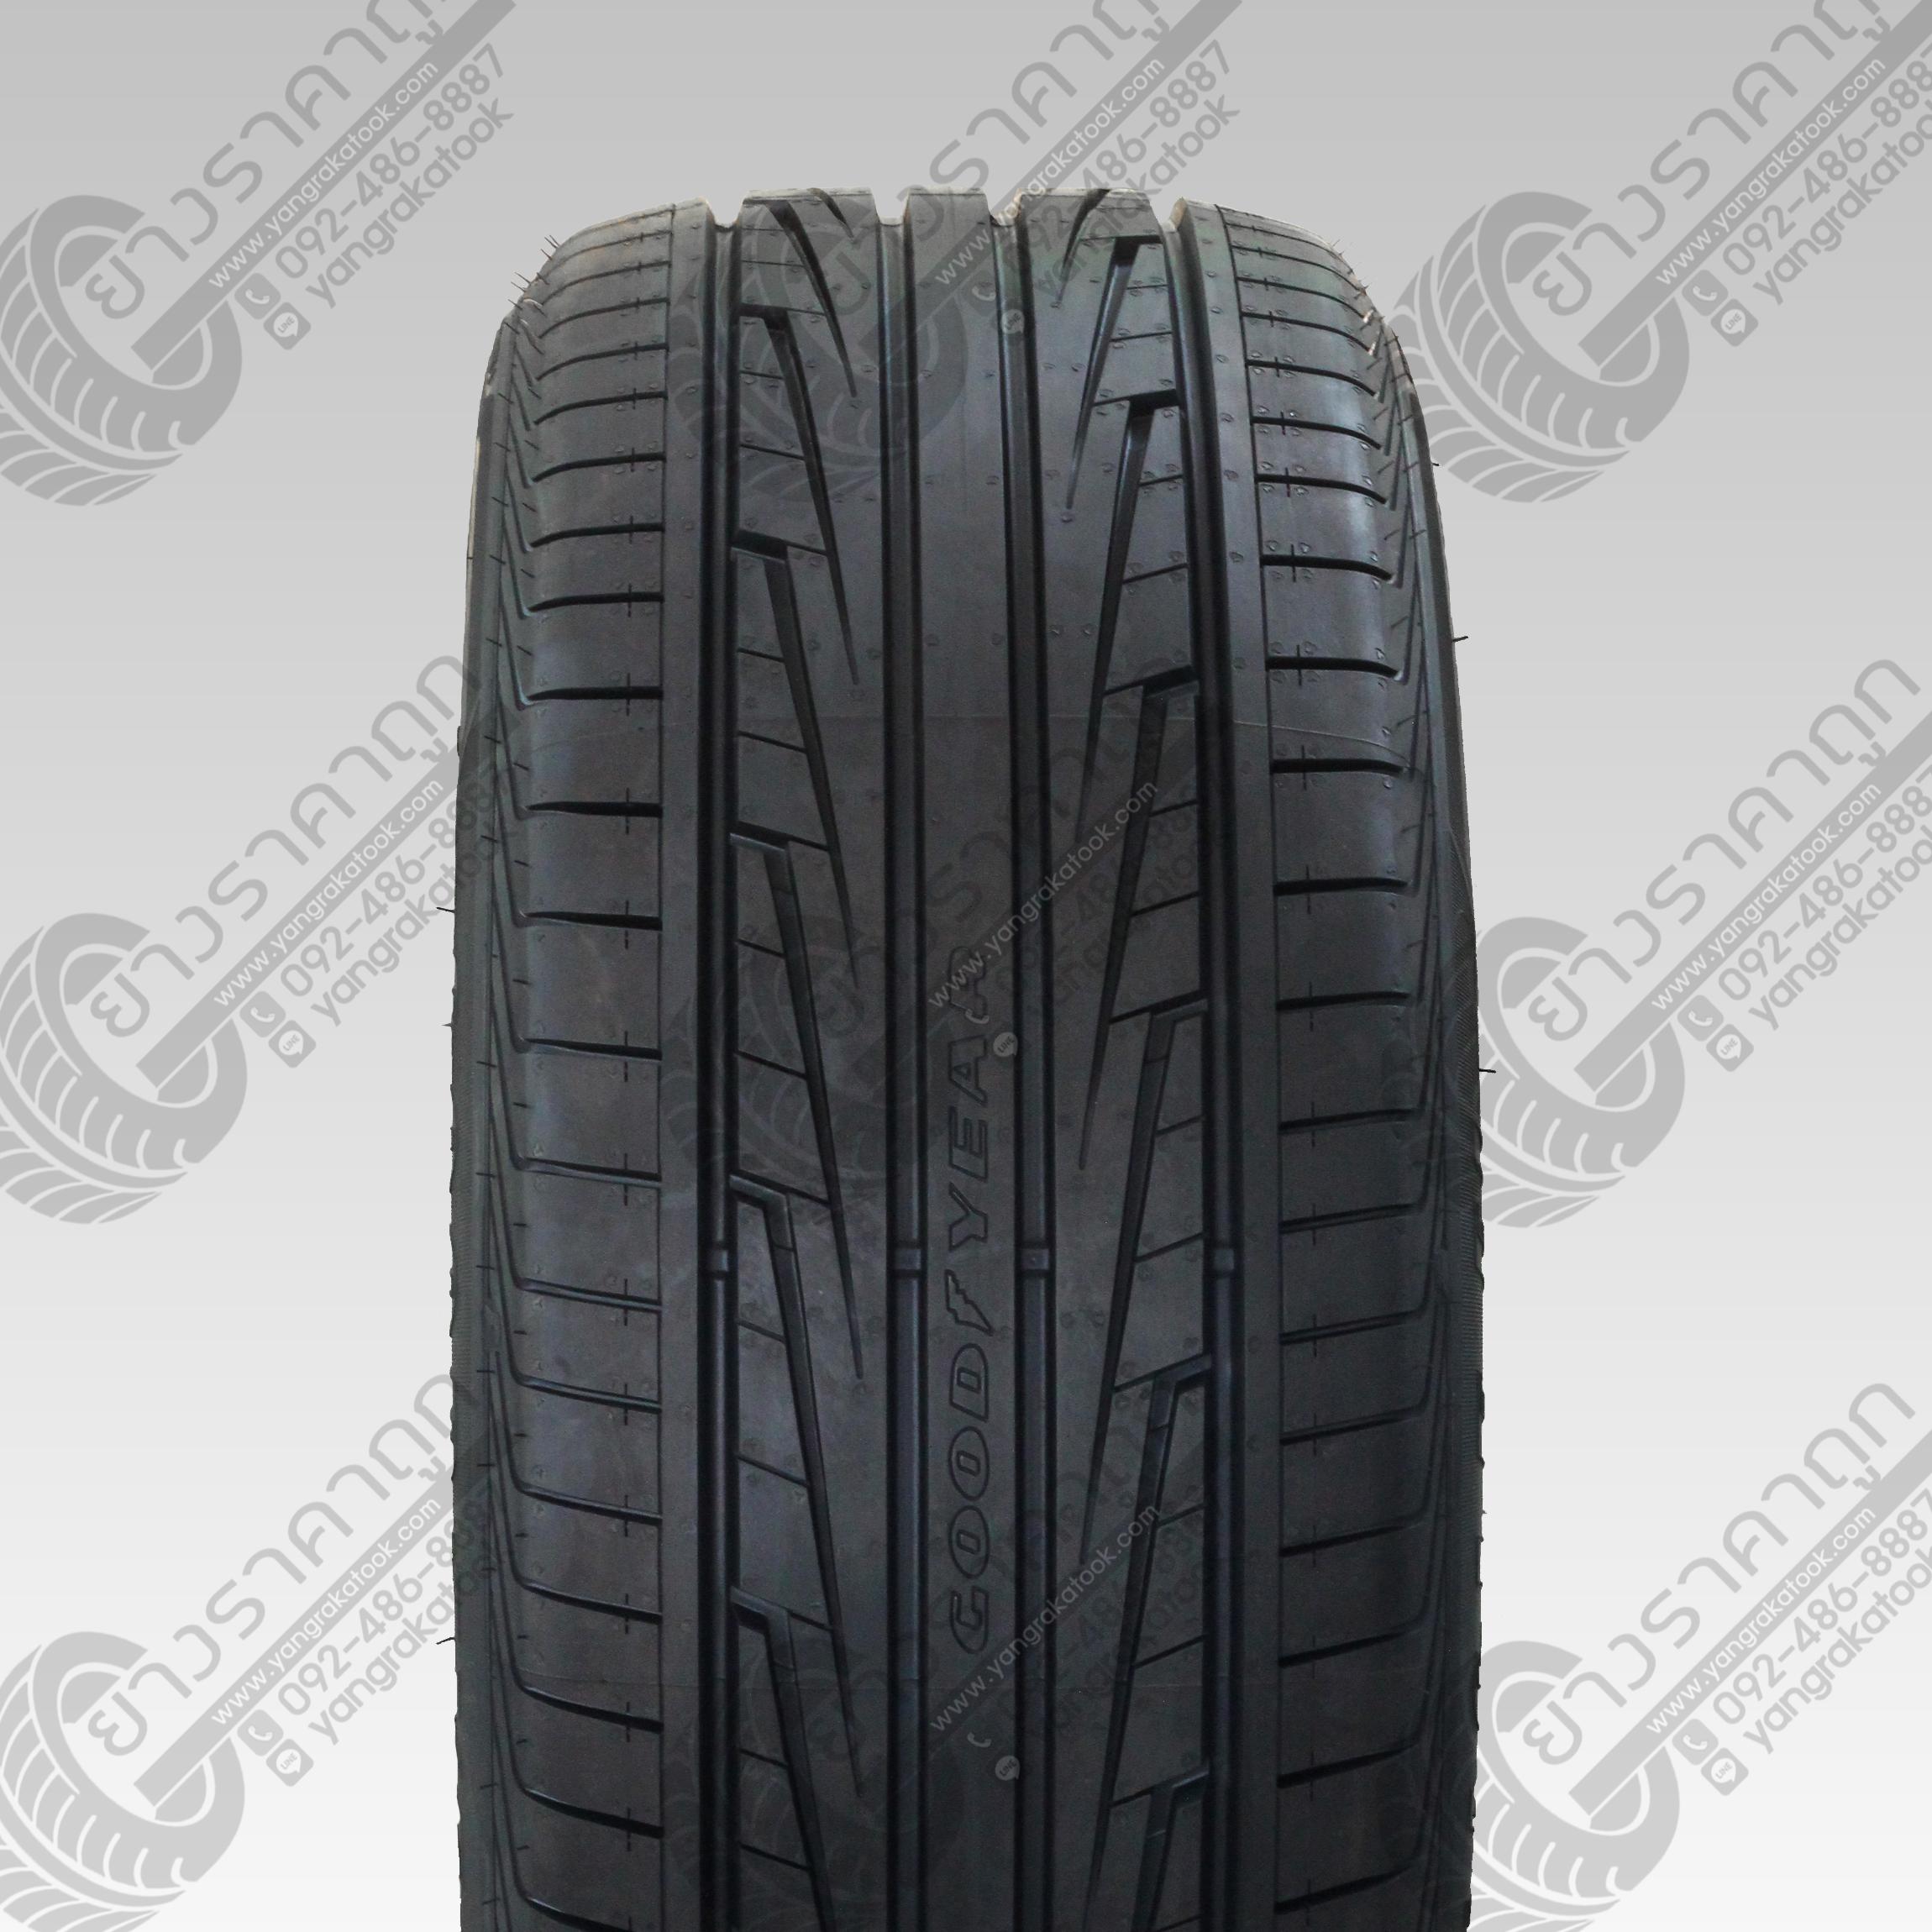 Goodyear F1 Directional 5 225/45R17 ยางใหม่ปี 15